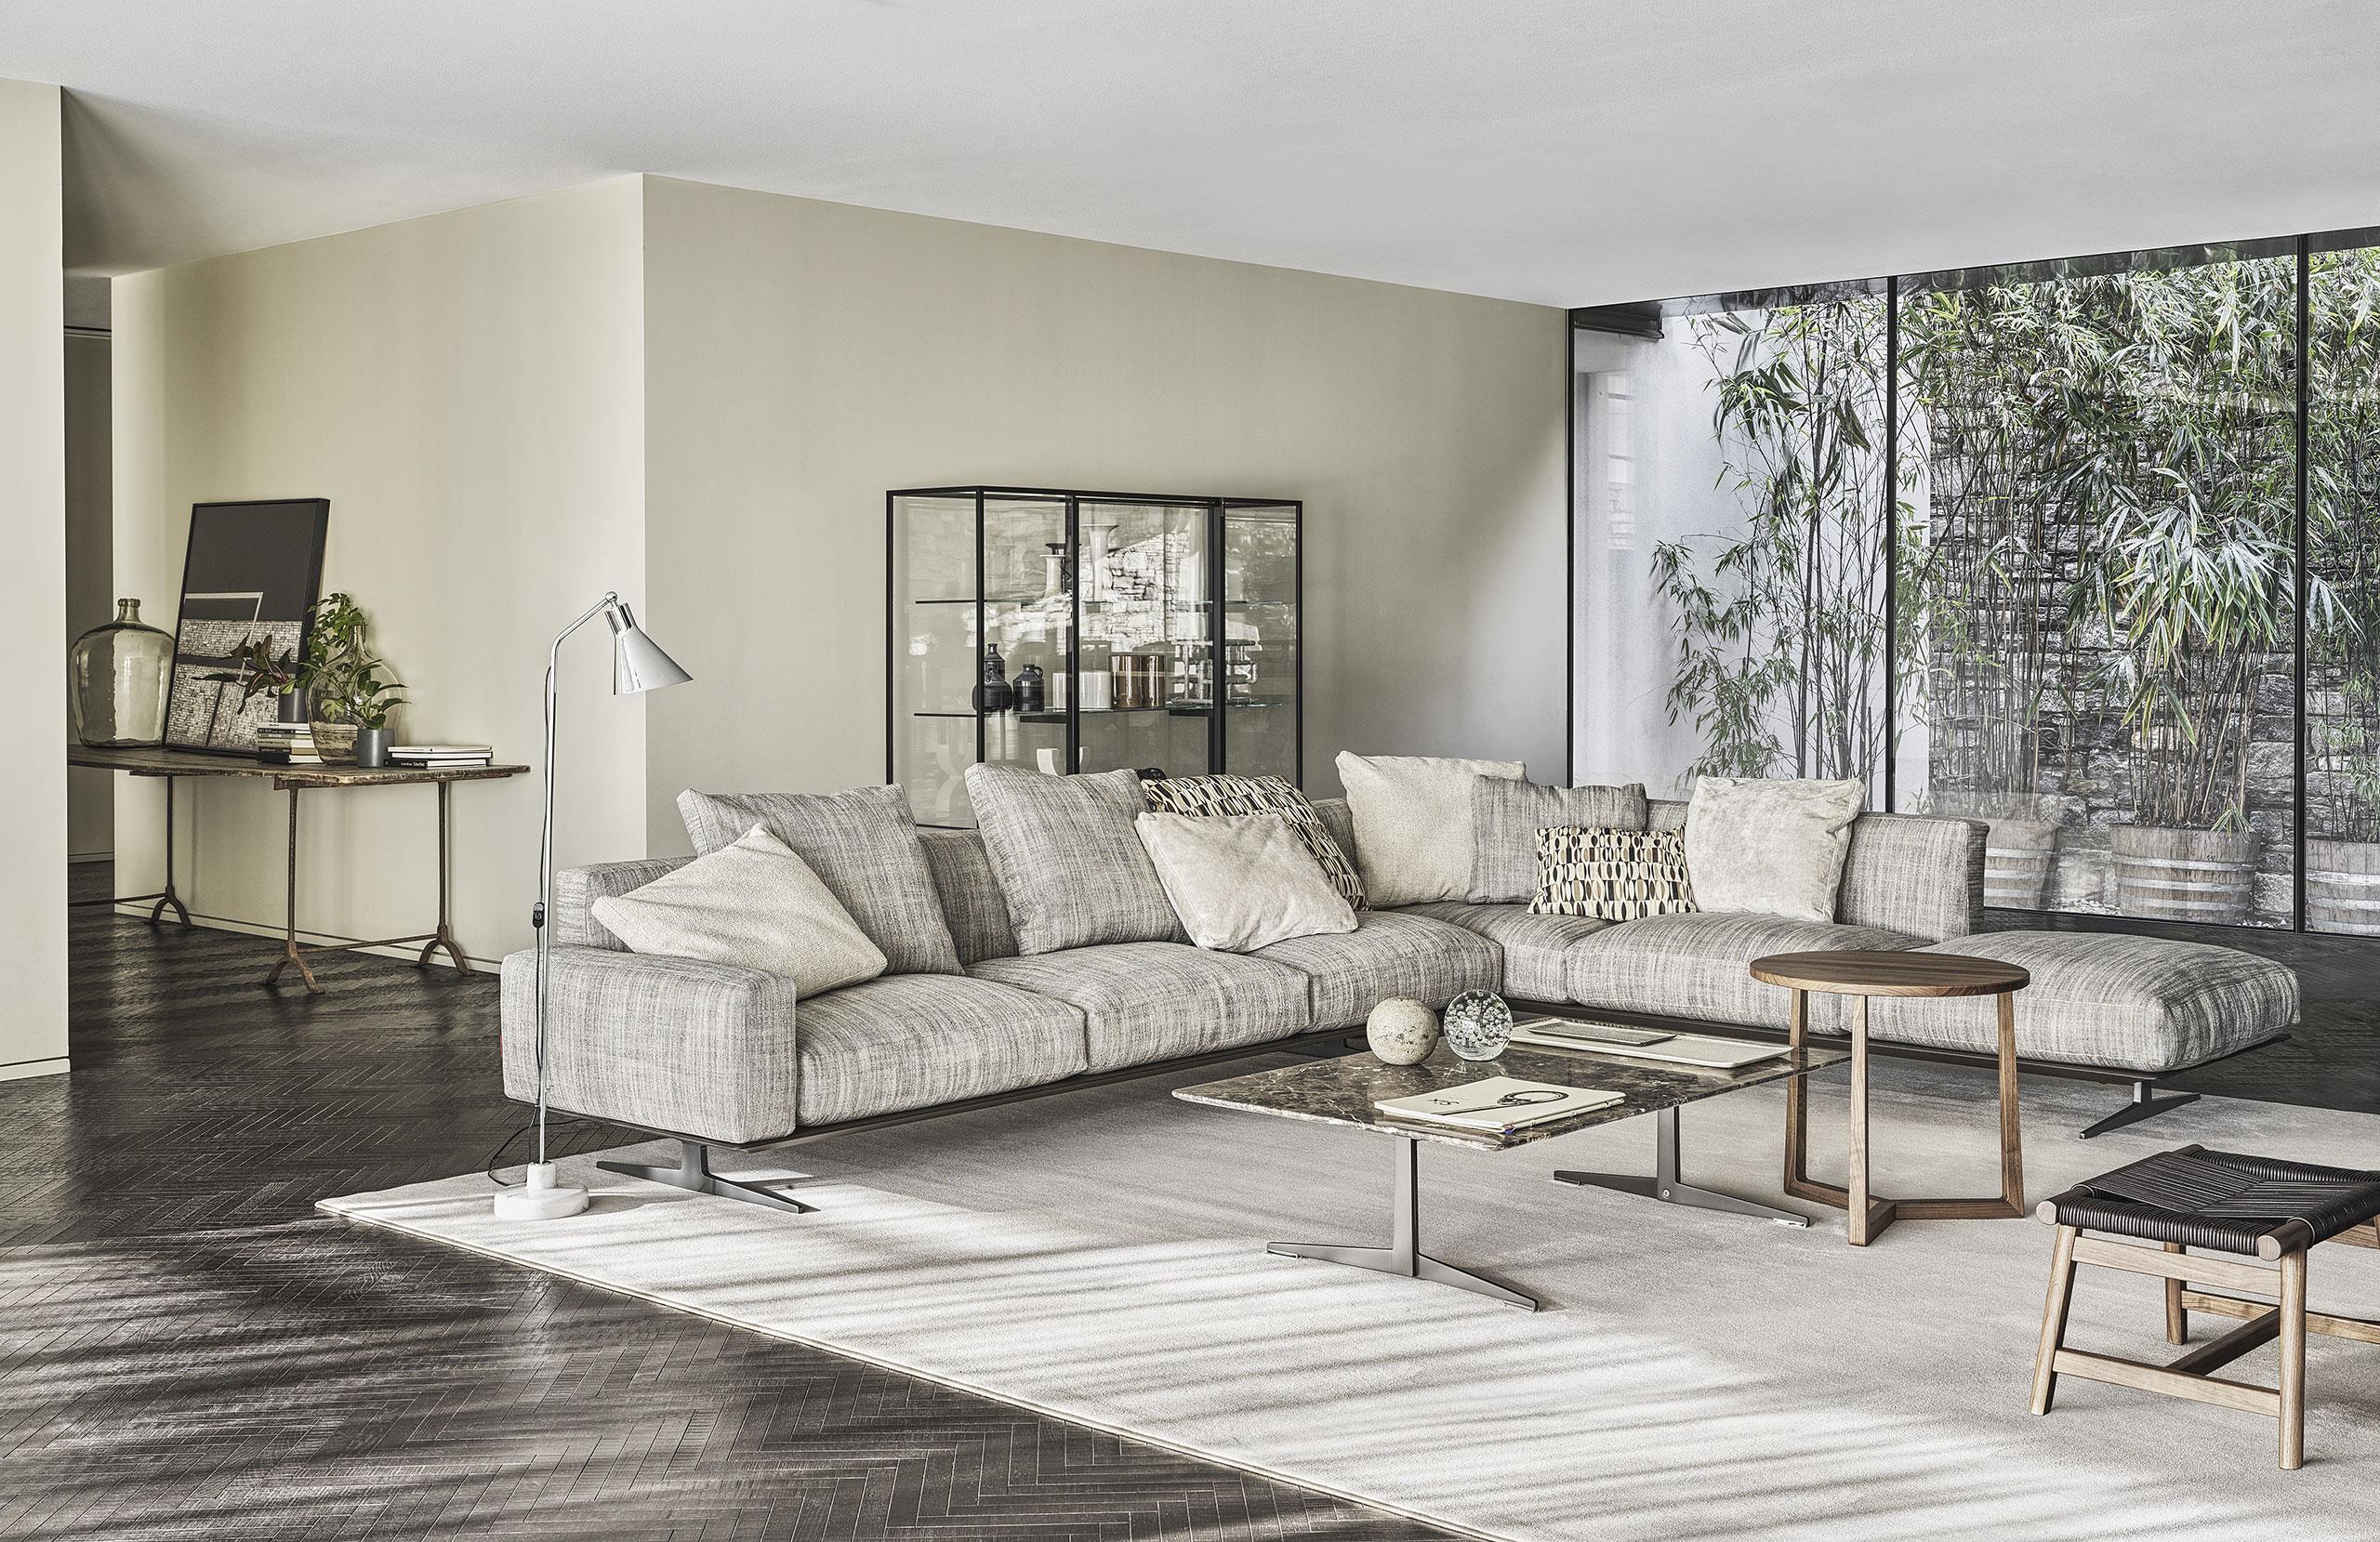 Soft Dream sofa by Antonio Citterio for Flexform. Photo© Flexform.